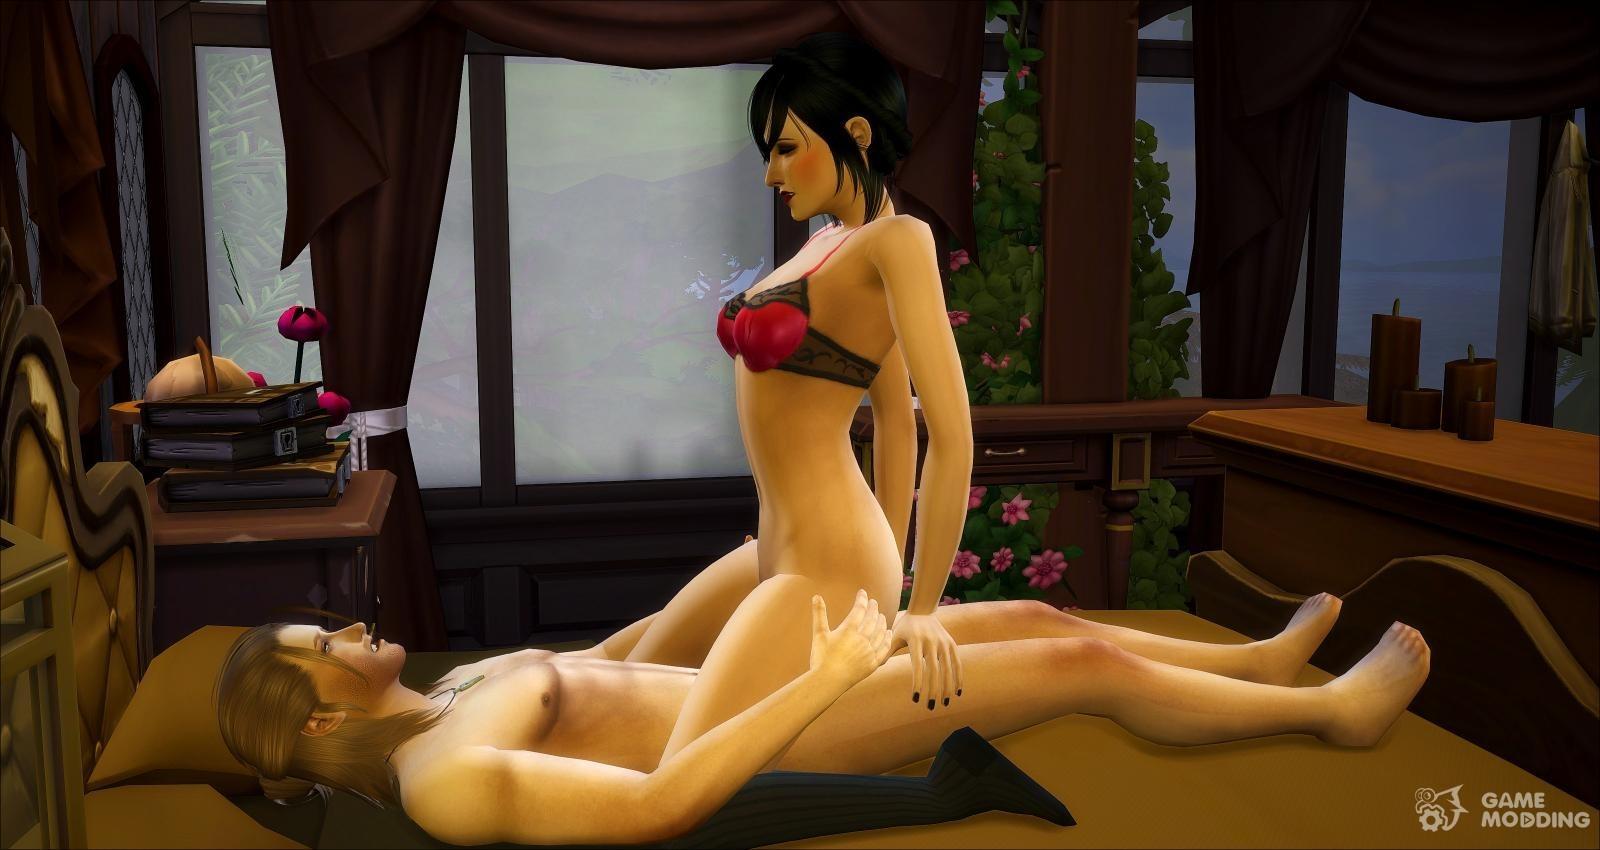 Porn Games Online Without Registration